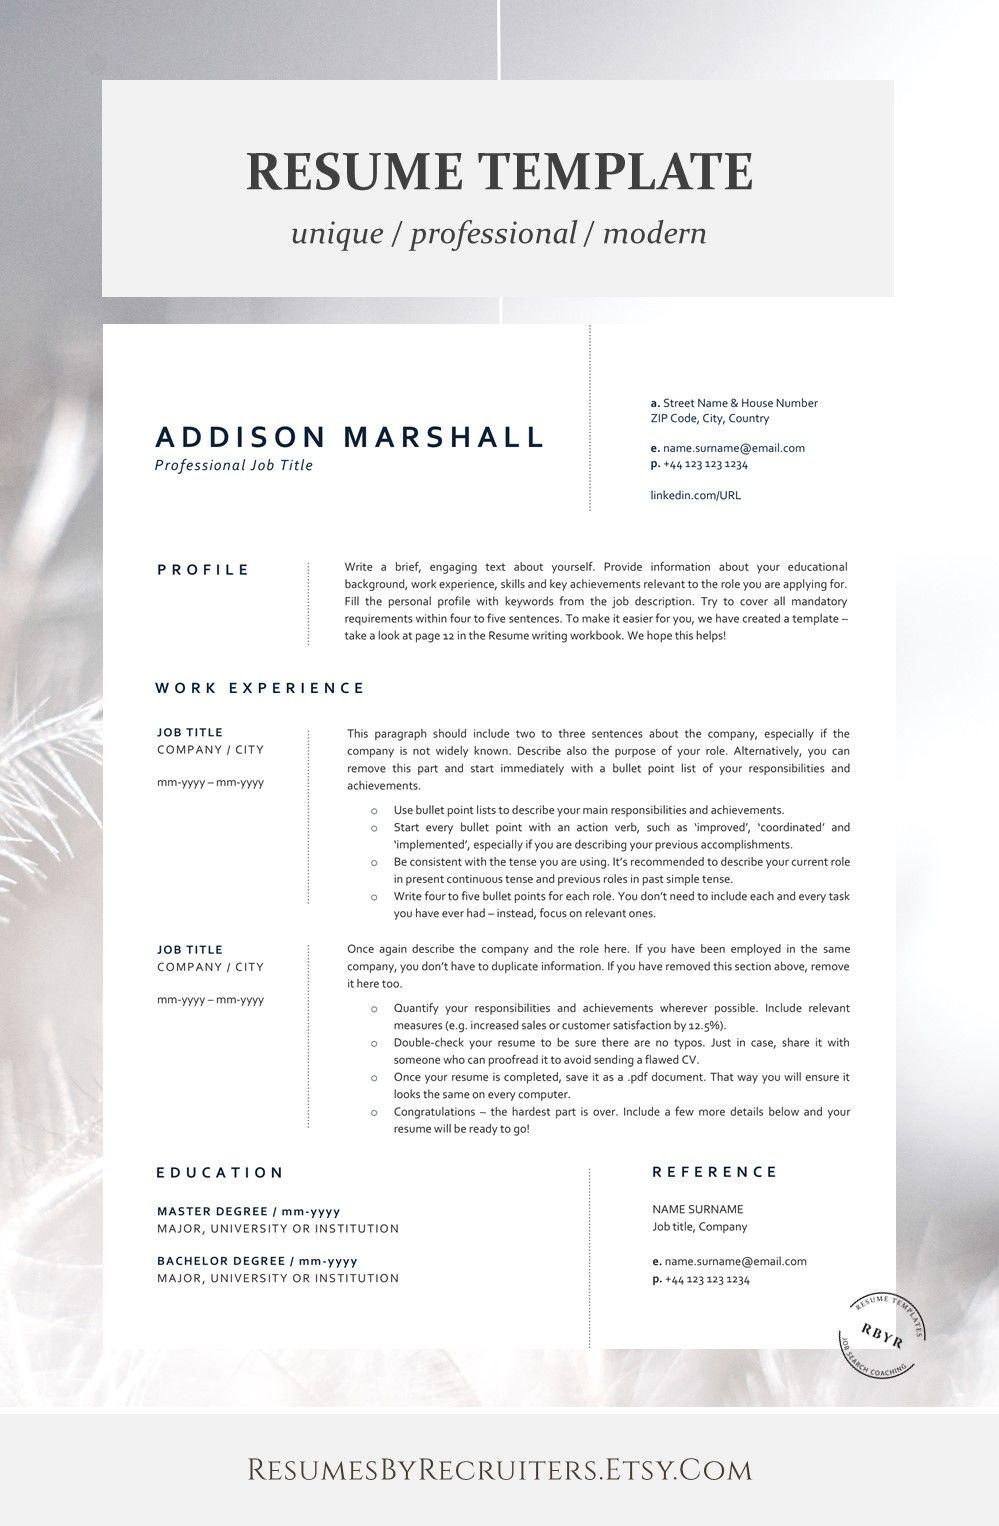 Minimalist CV Resume Template, Instant Download Onepage